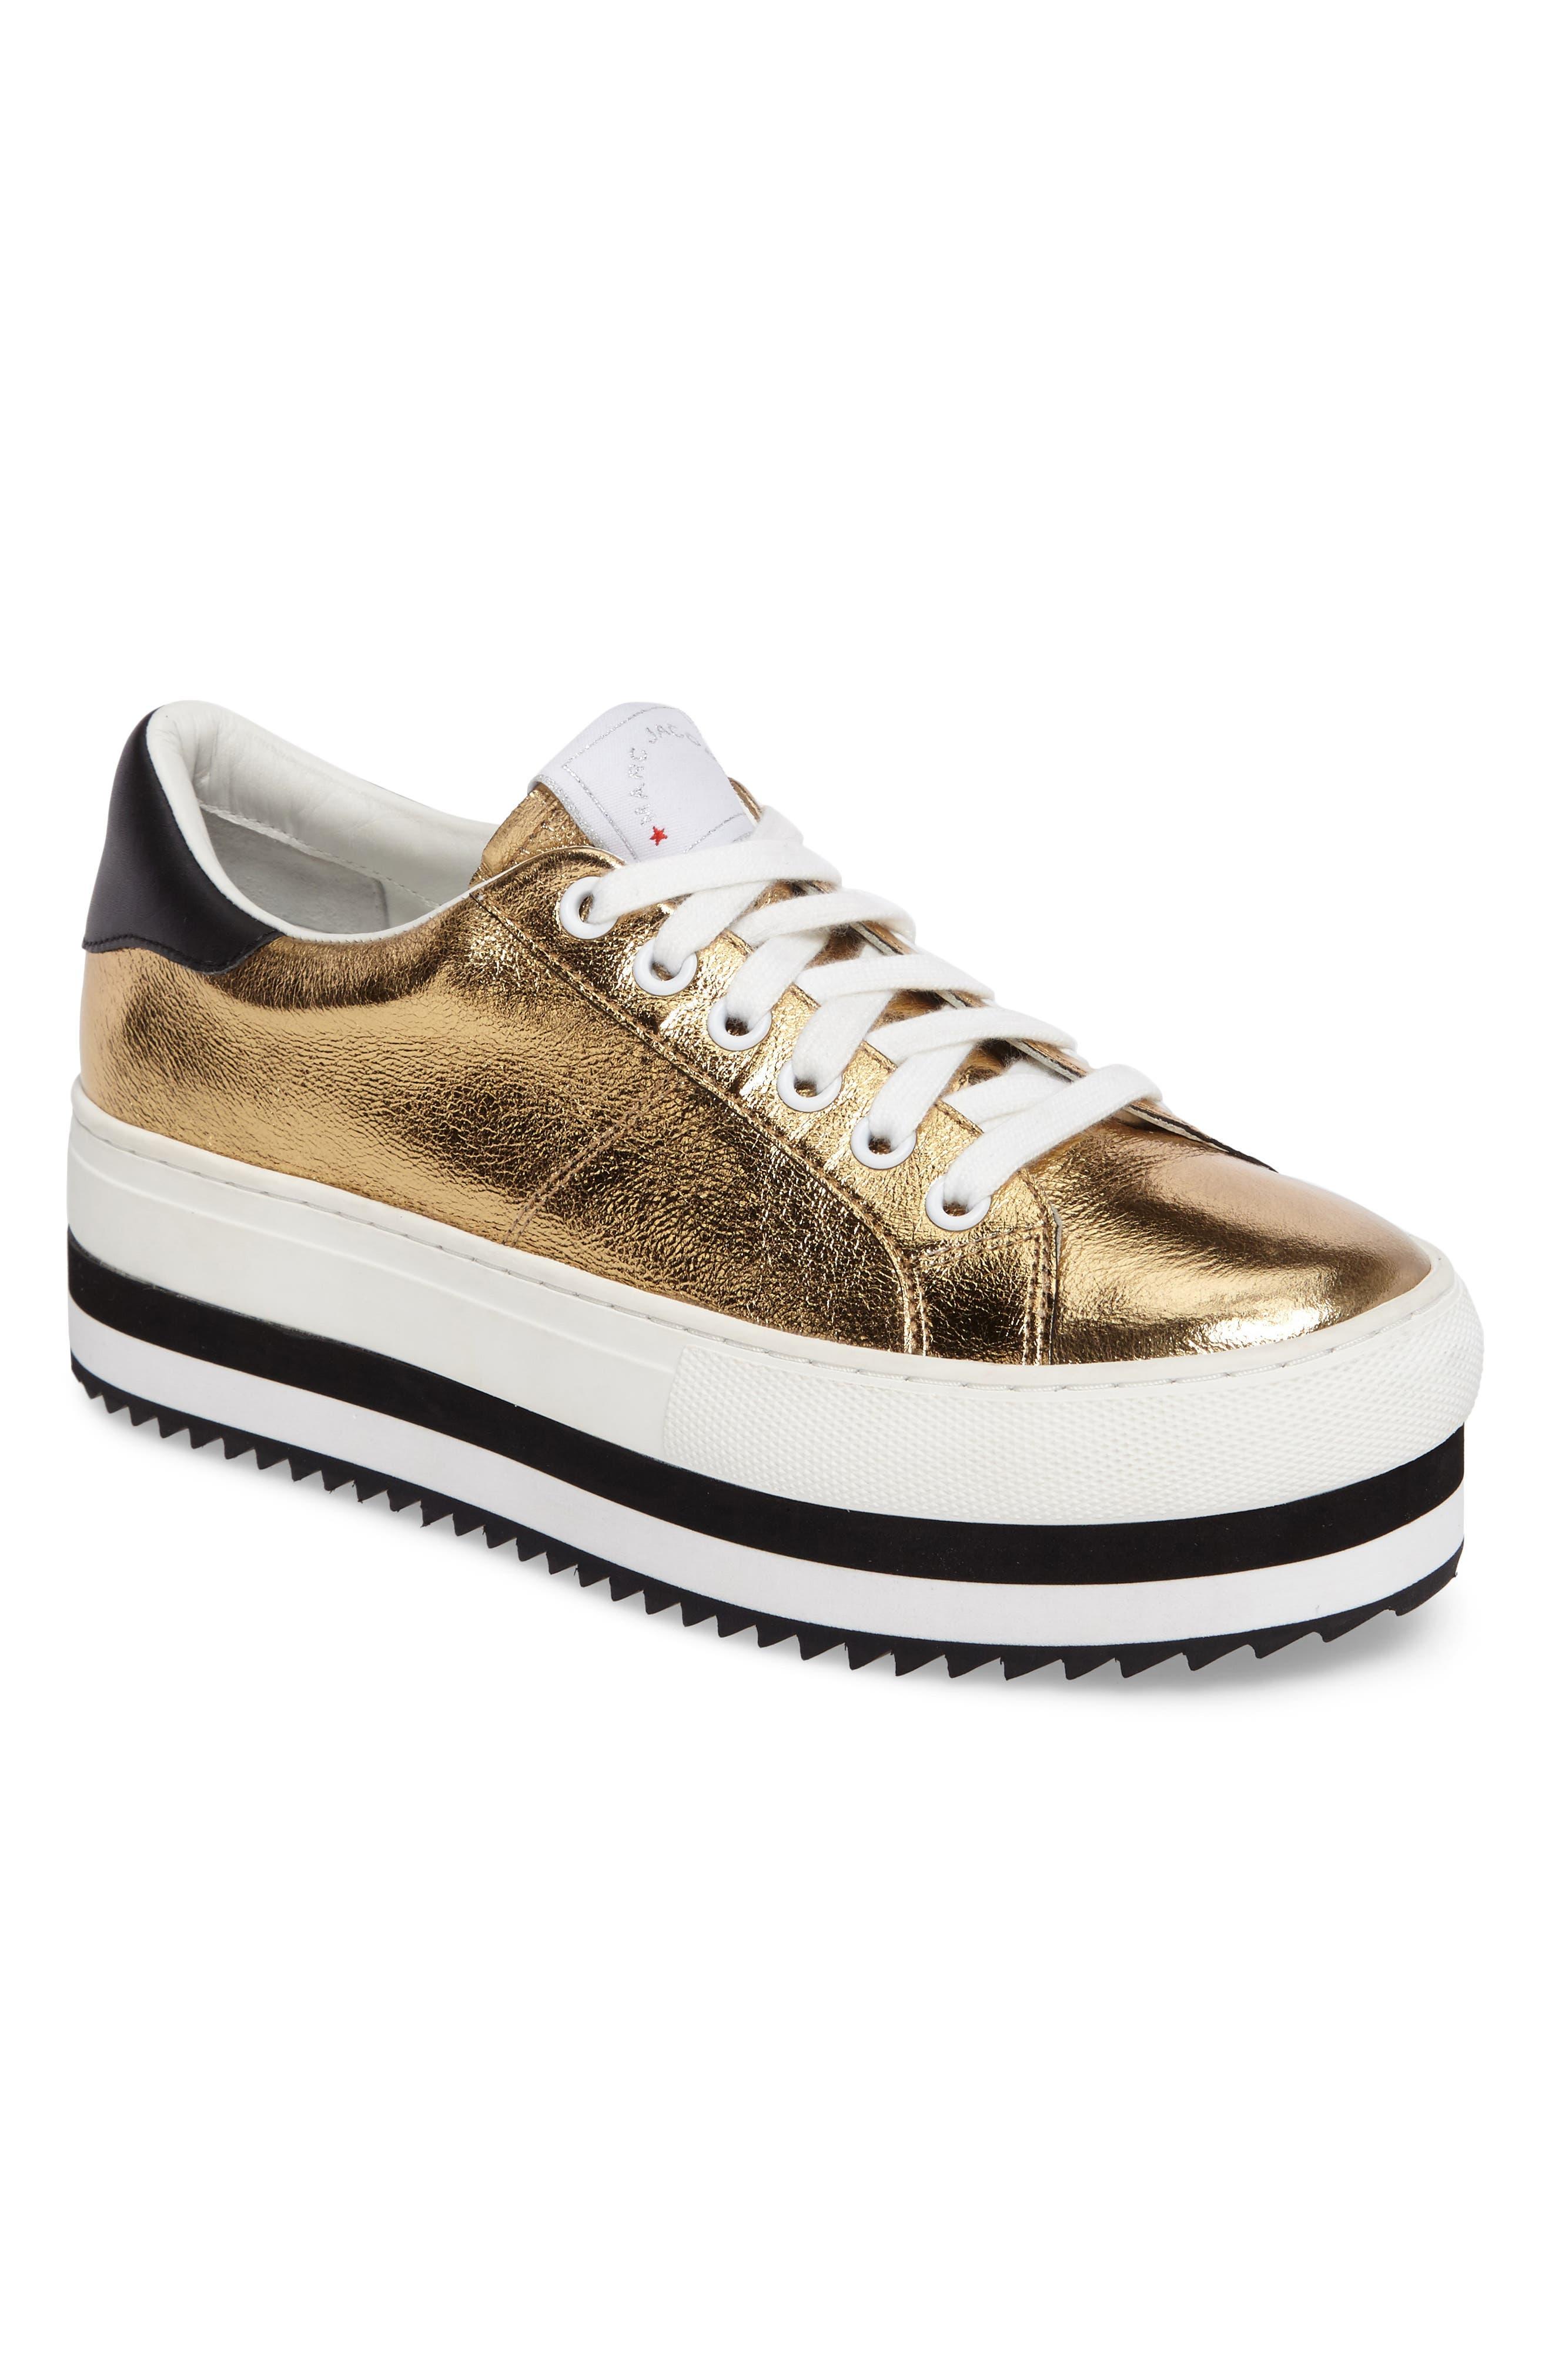 MARC JACOBS Grand Platform Sneaker (Women)